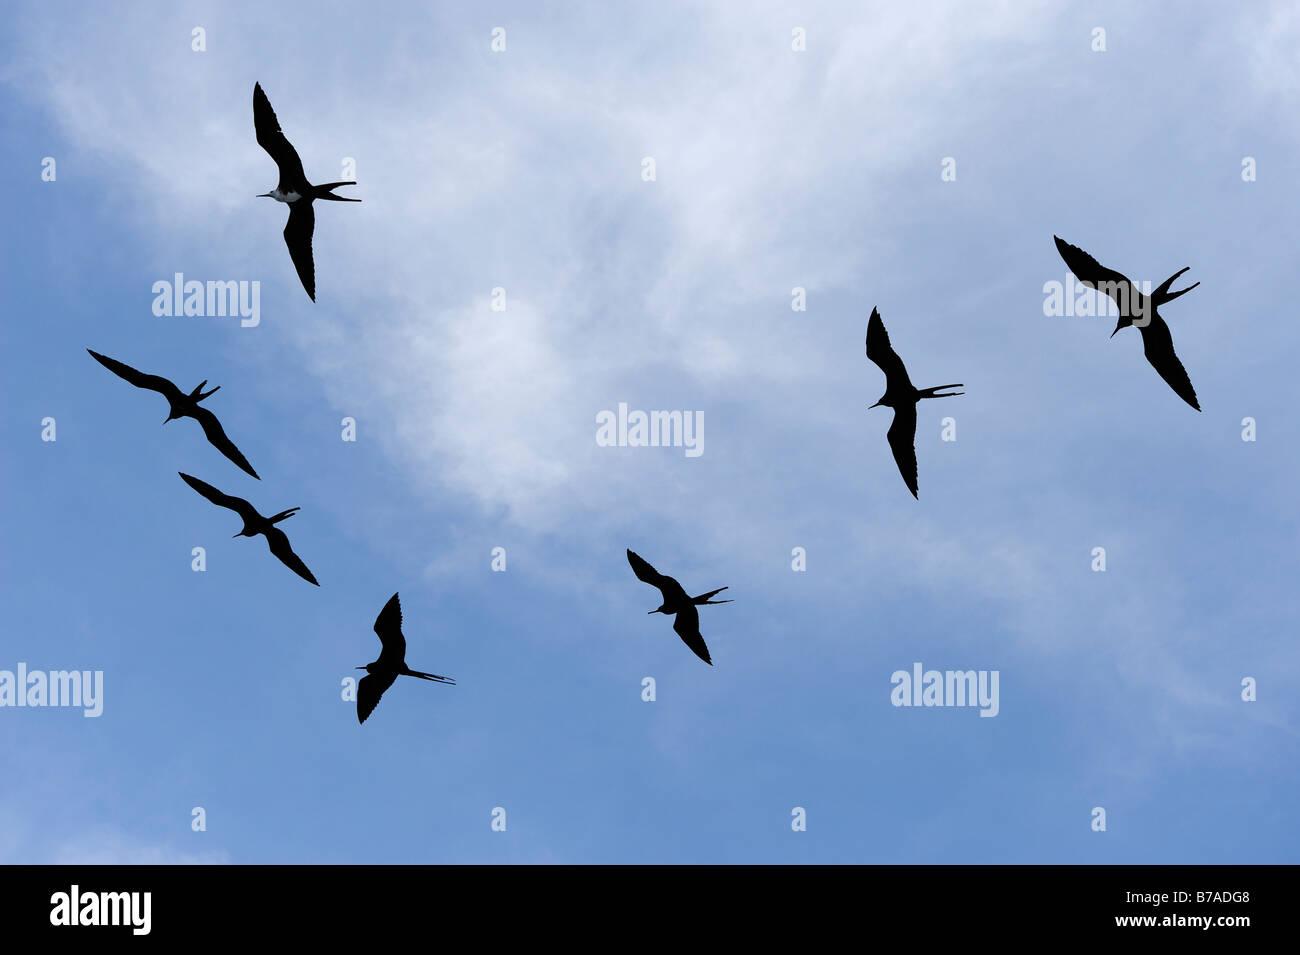 Great Frigatebirds (Fregata minor) in flight, Galapagos Islands, Ecuador, South America - Stock Image